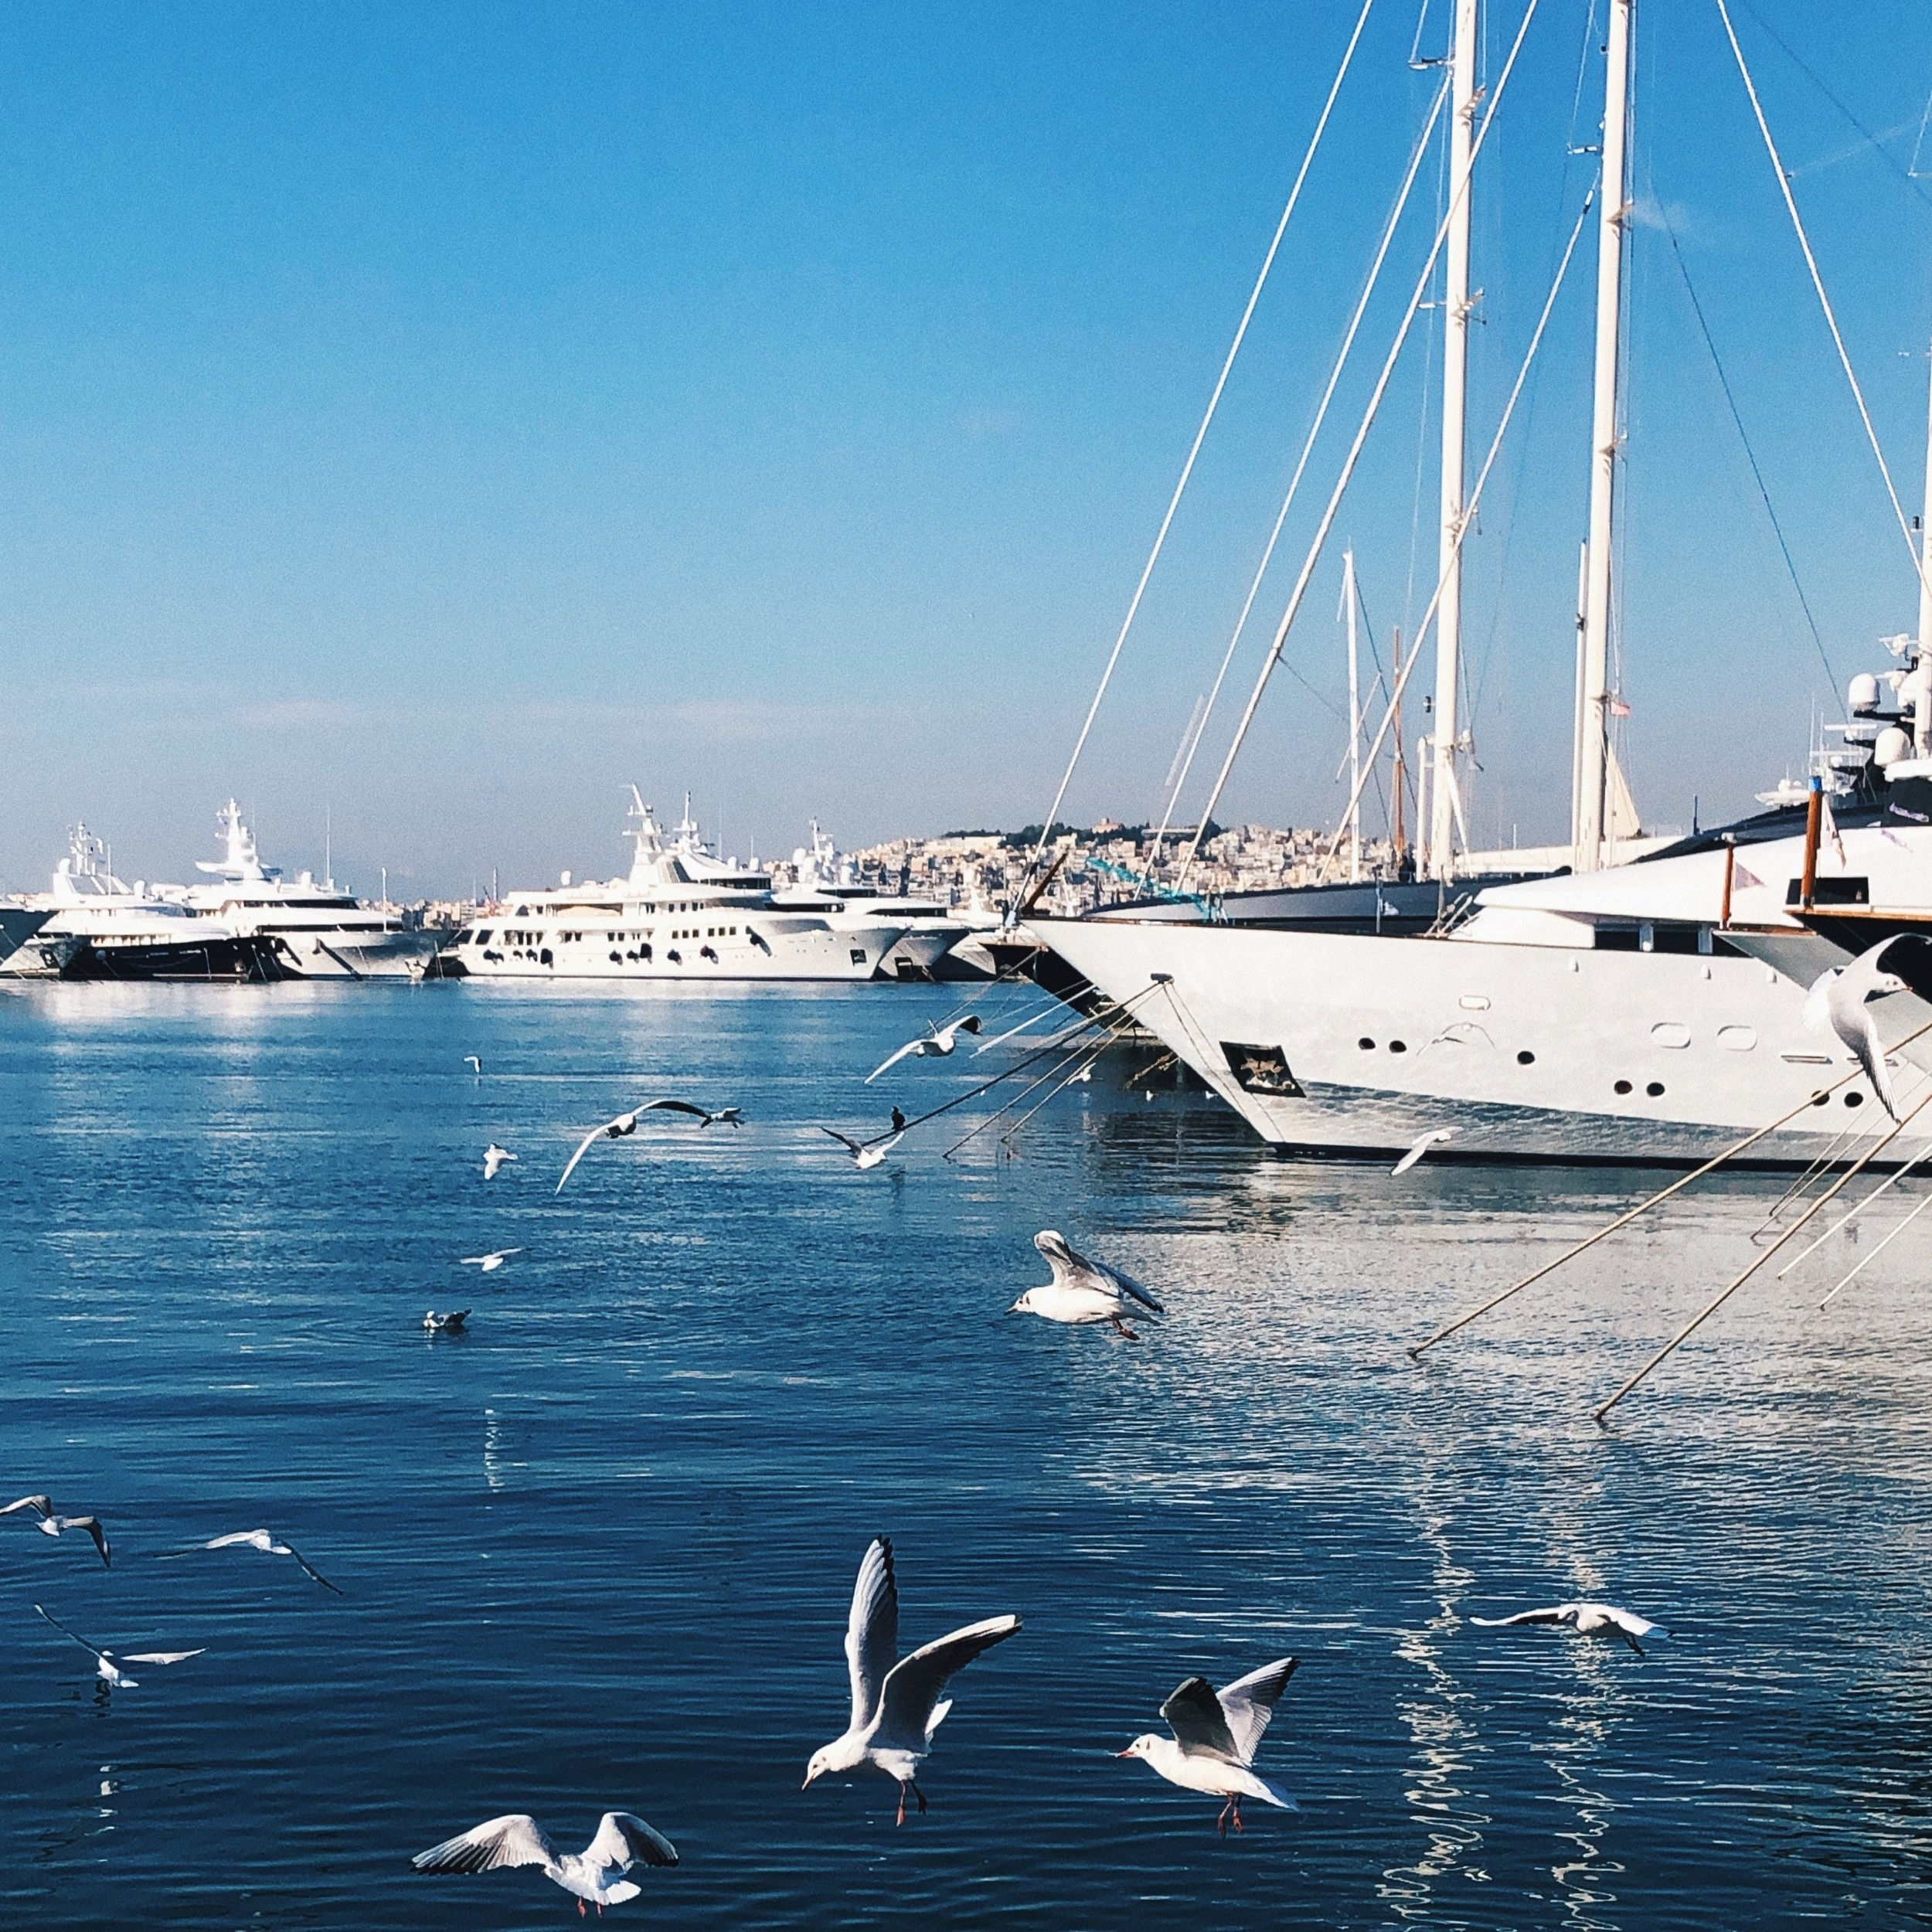 Athens Marina, Greece iuliia-isakova.jpg